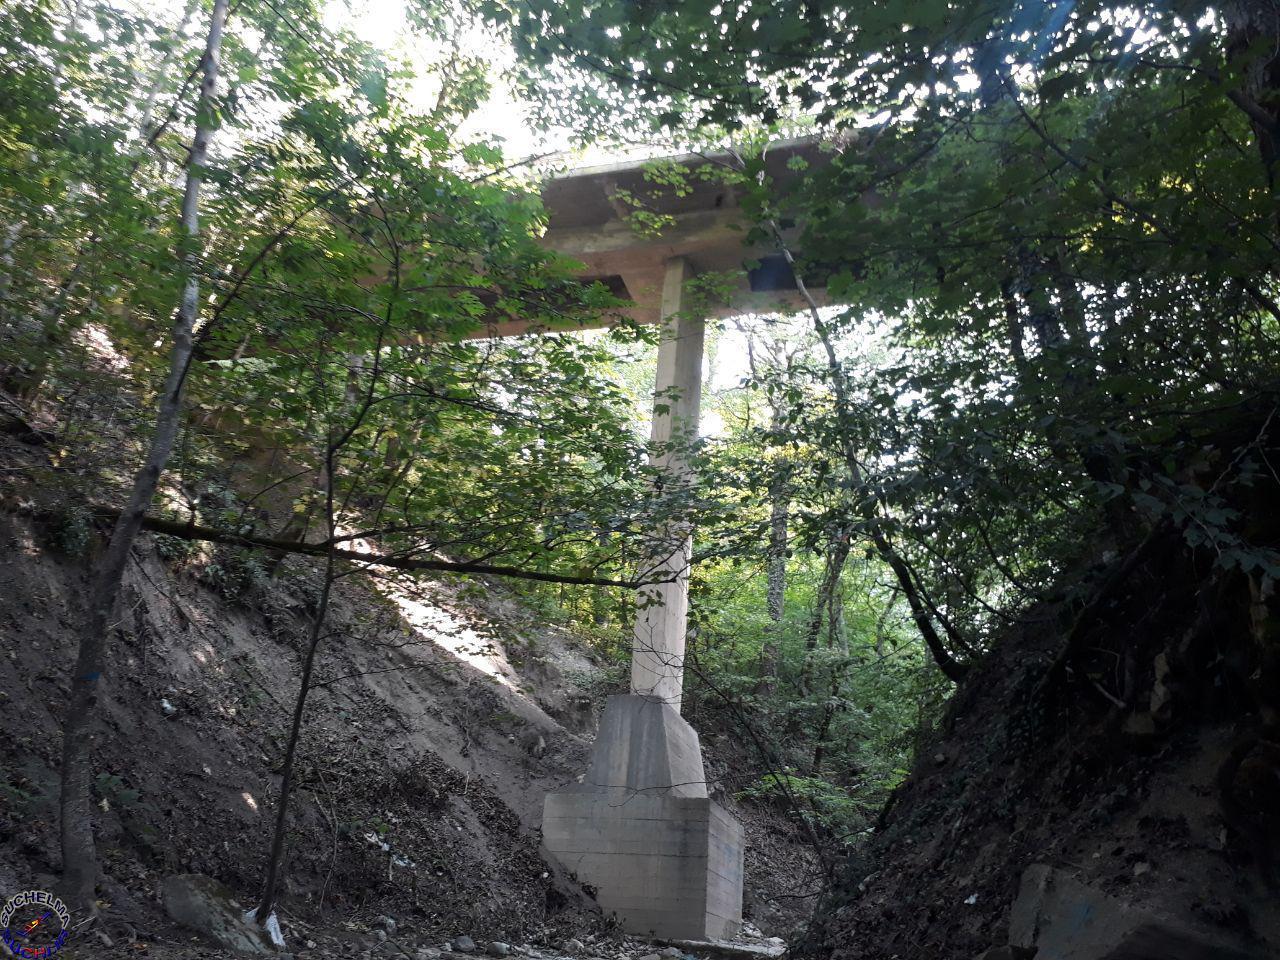 پل روگذر سی متری سوچلما